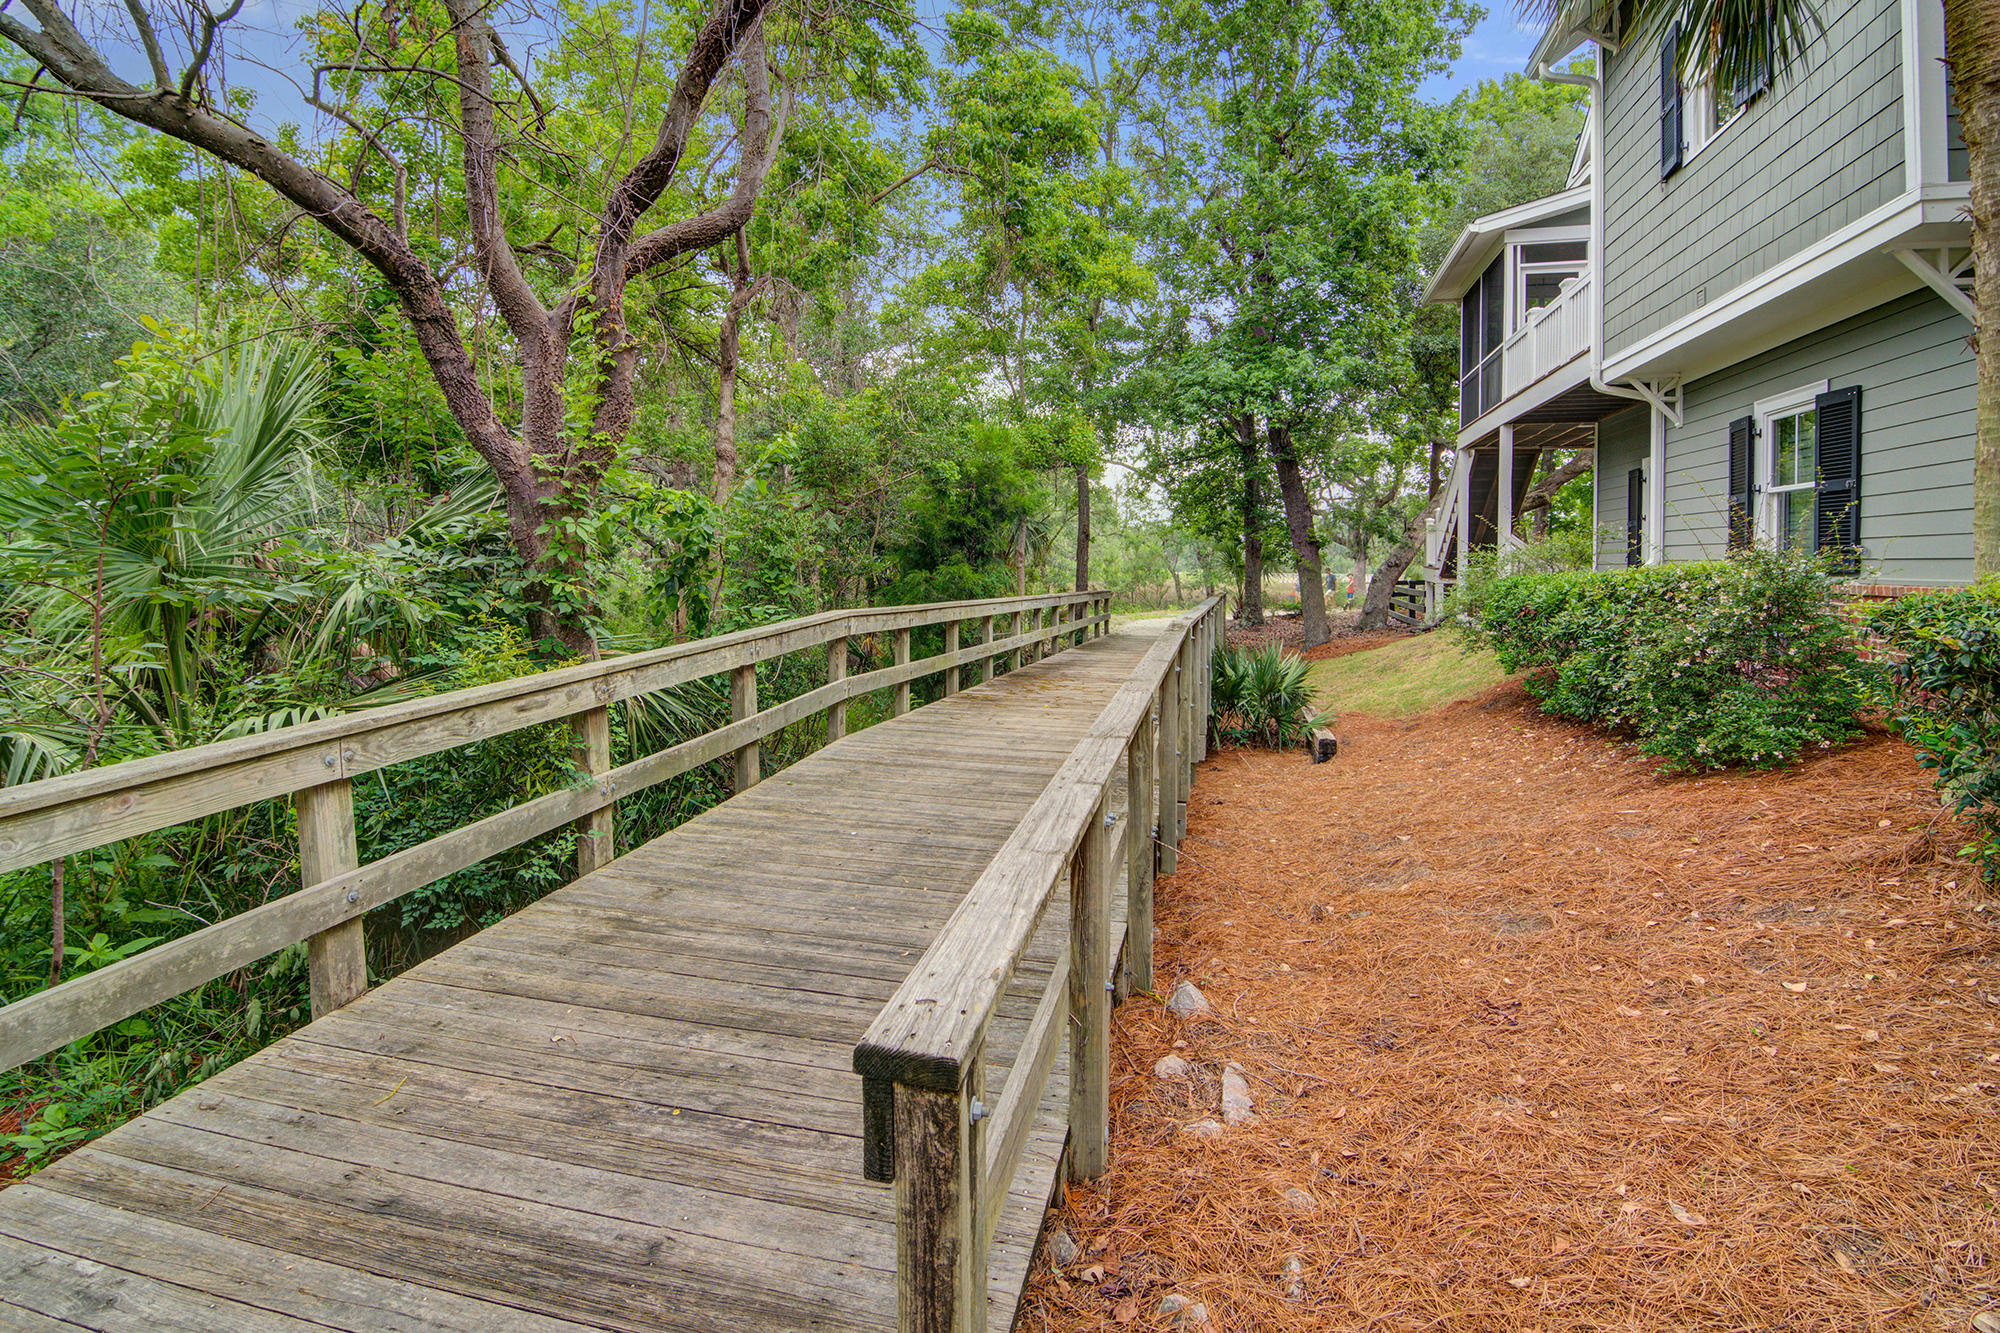 Daniel Island Homes For Sale - 1879 Pierce, Daniel Island, SC - 54